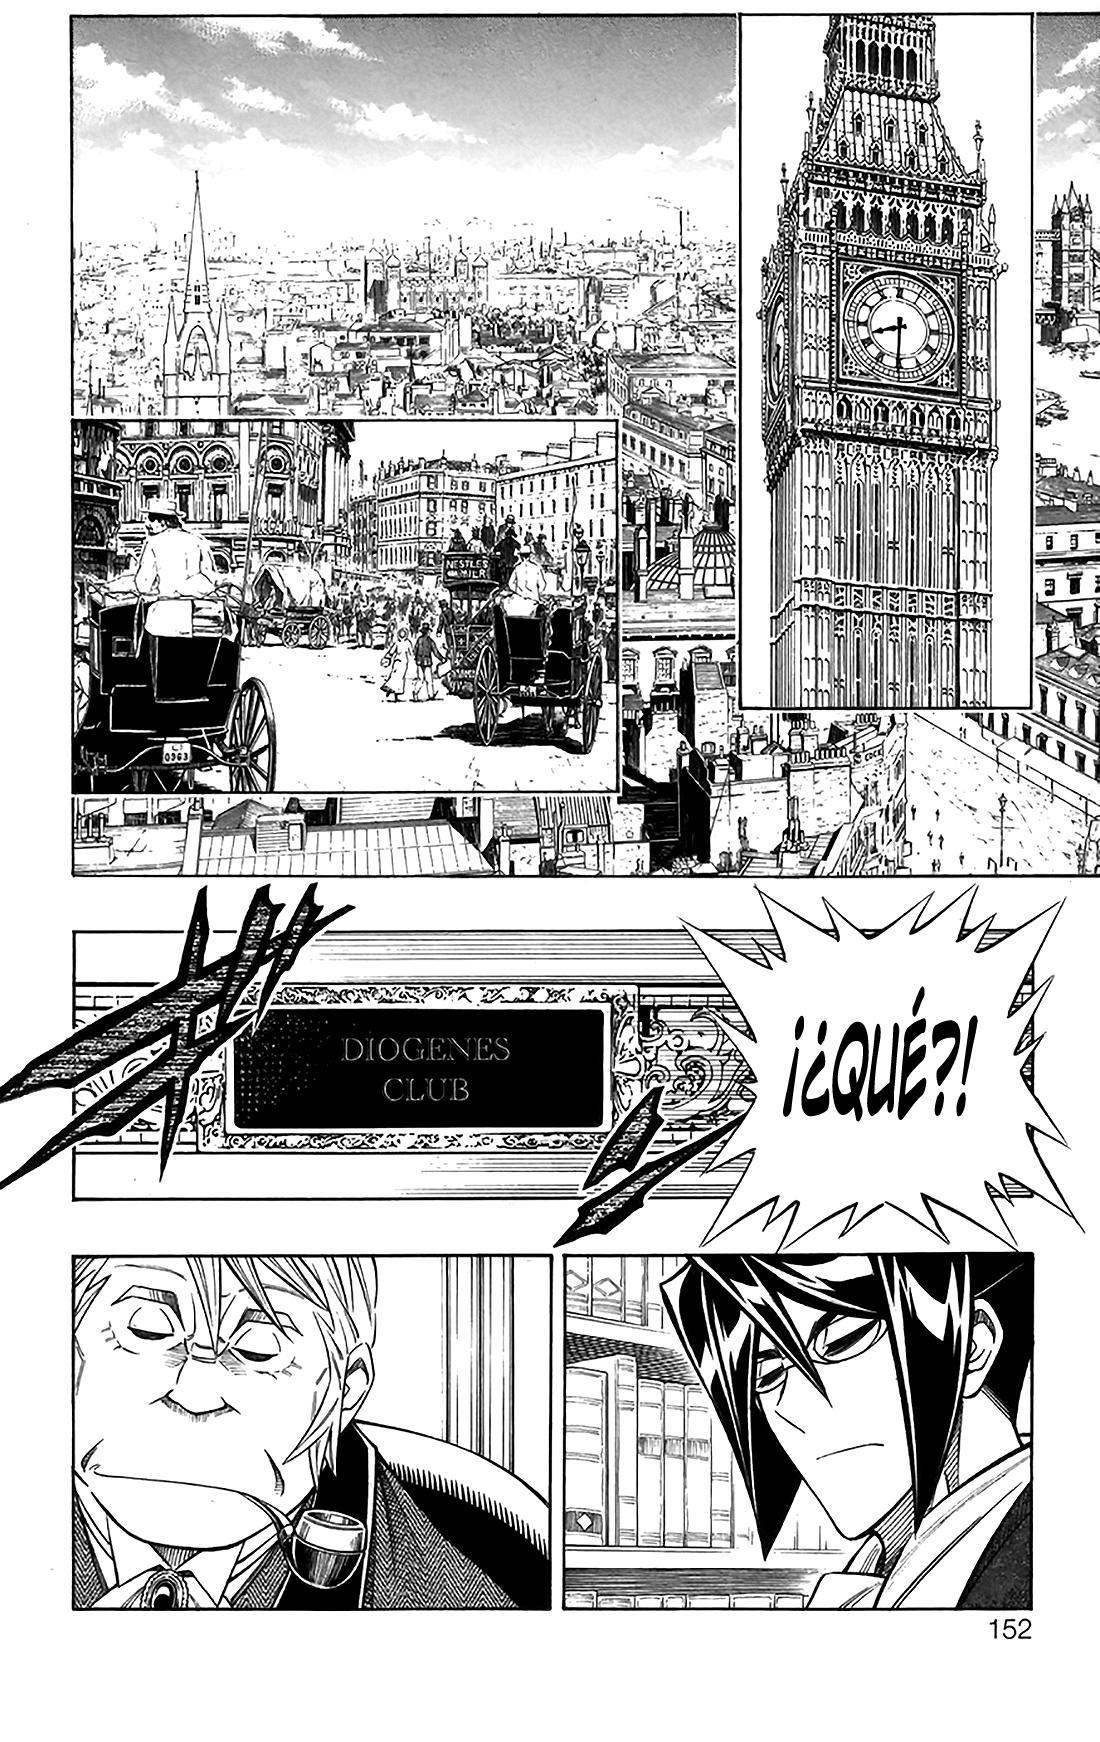 http://c5.ninemanga.com/es_manga/45/18797/447912/34046f12f8fcaa665bab14cabf140fb4.jpg Page 8